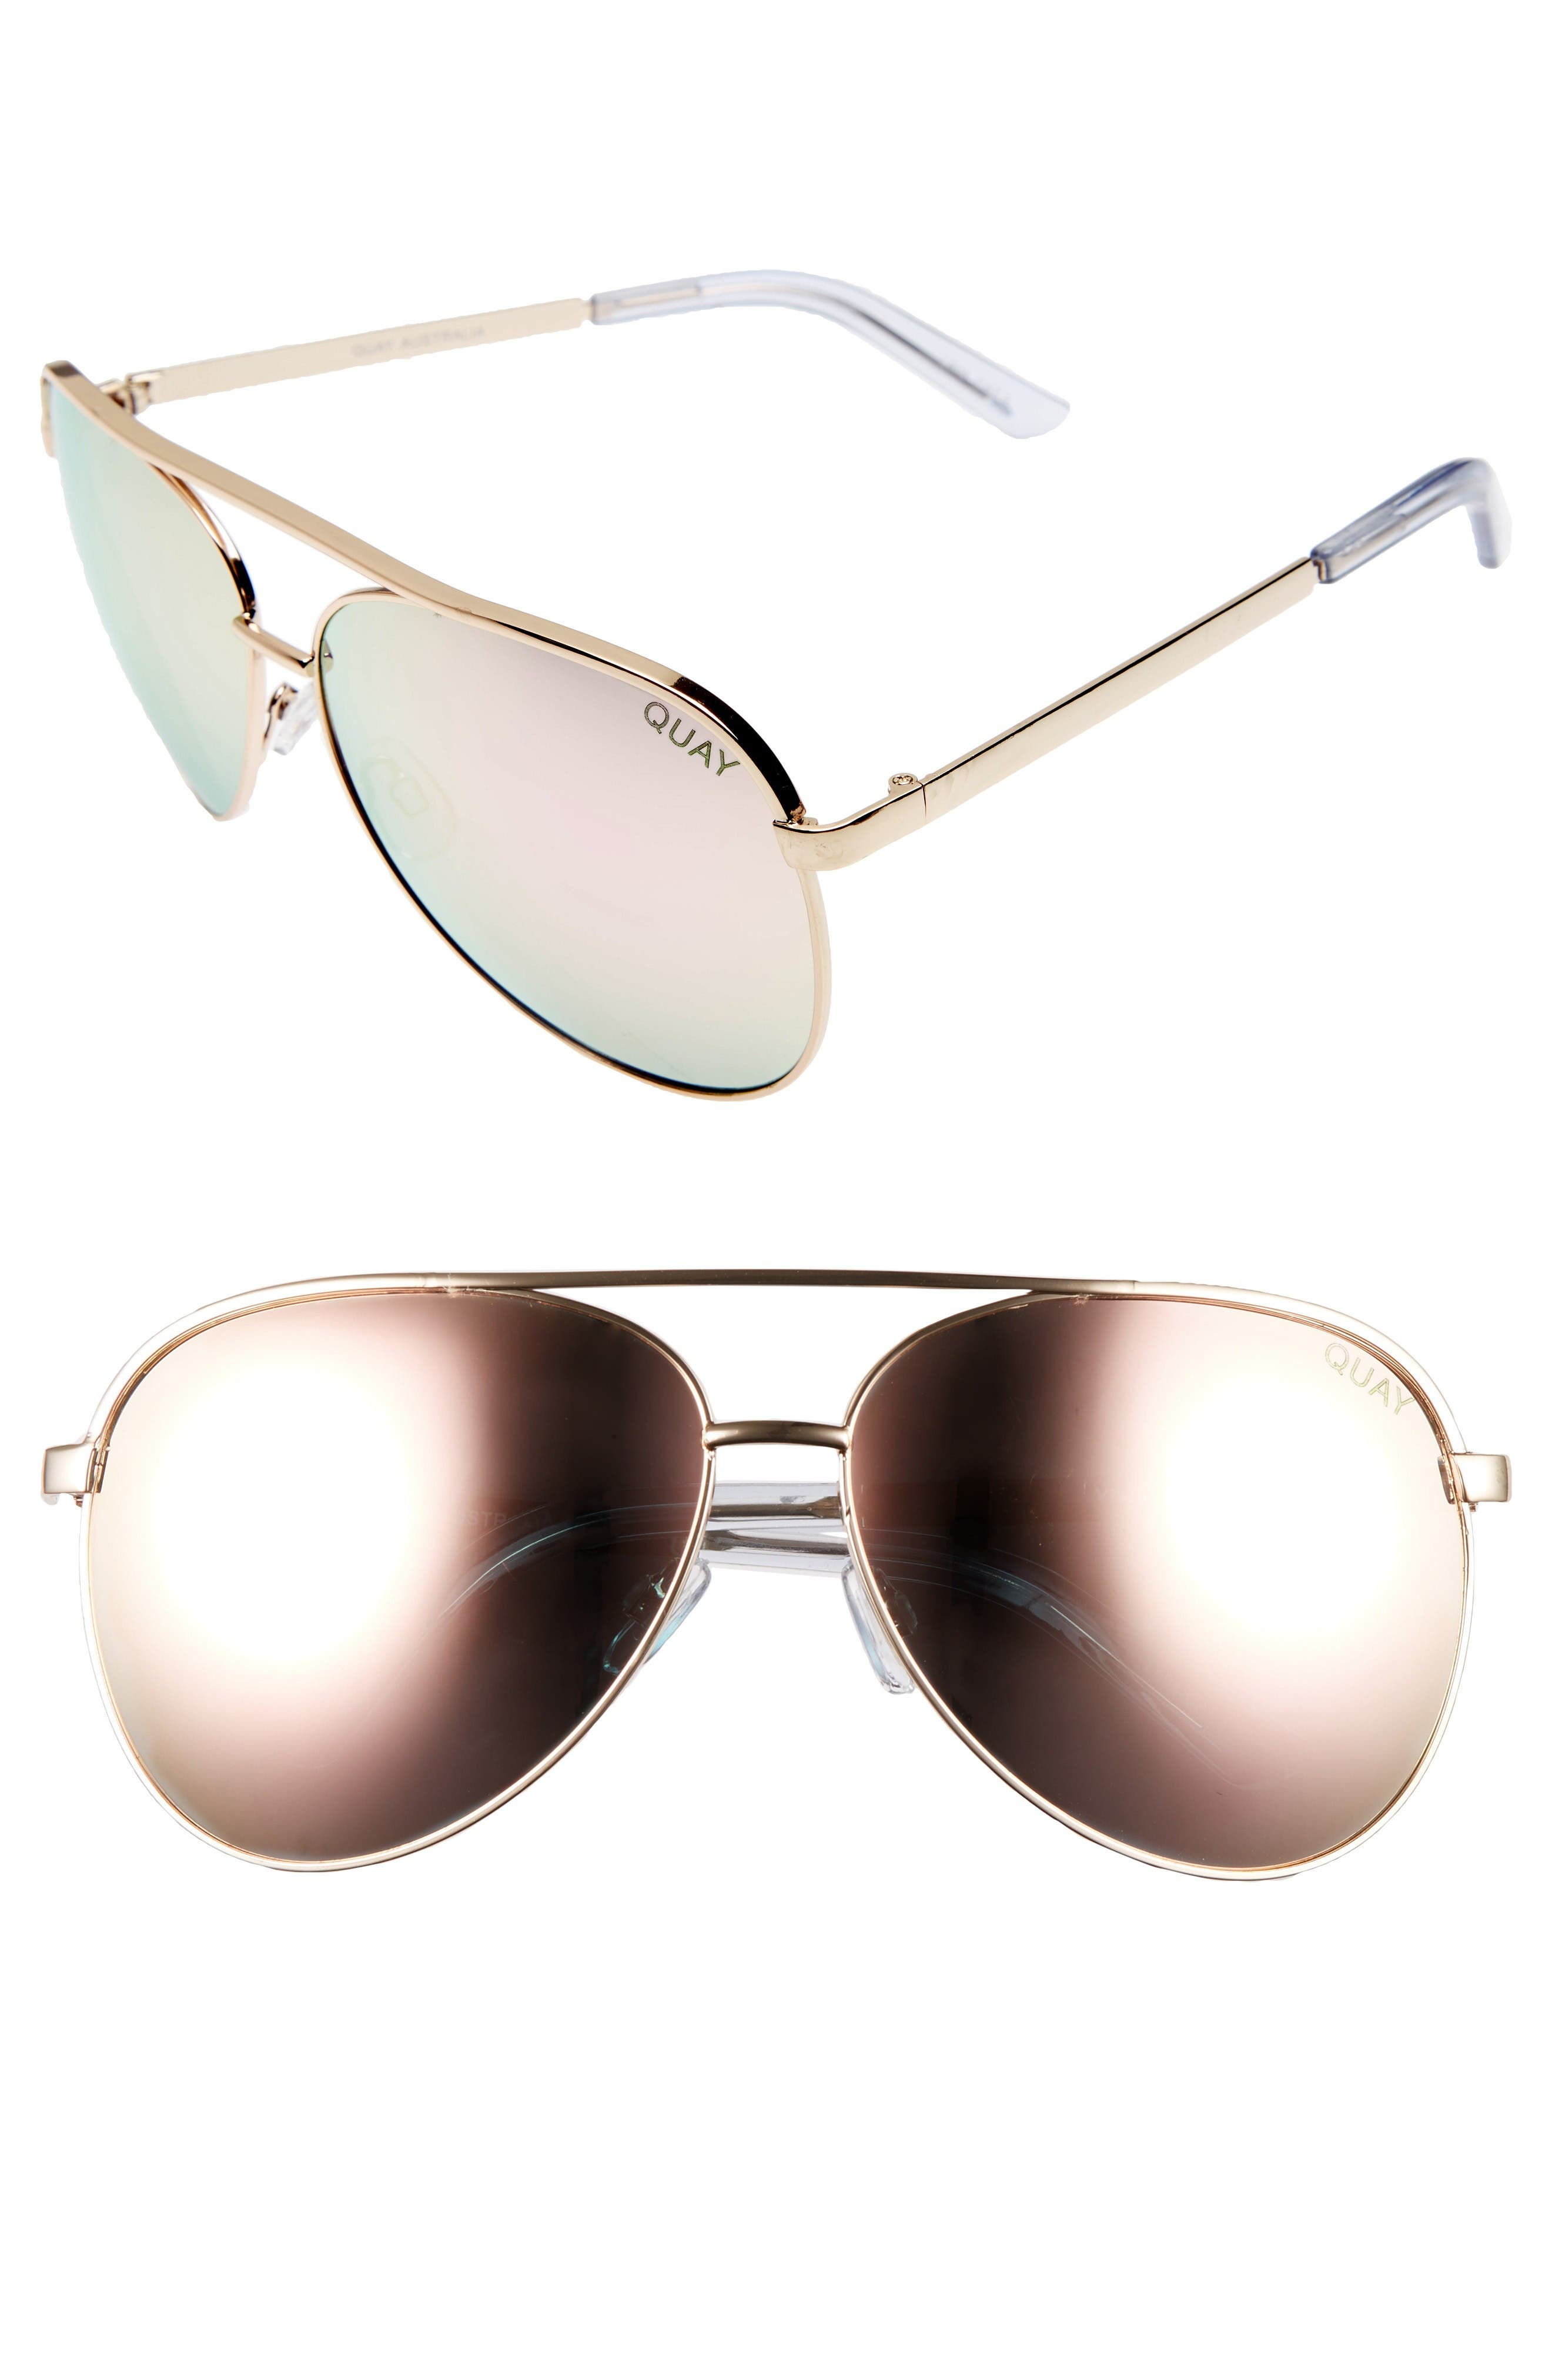 Quay Australia Vivienne 64mm Aviator Sunglasses